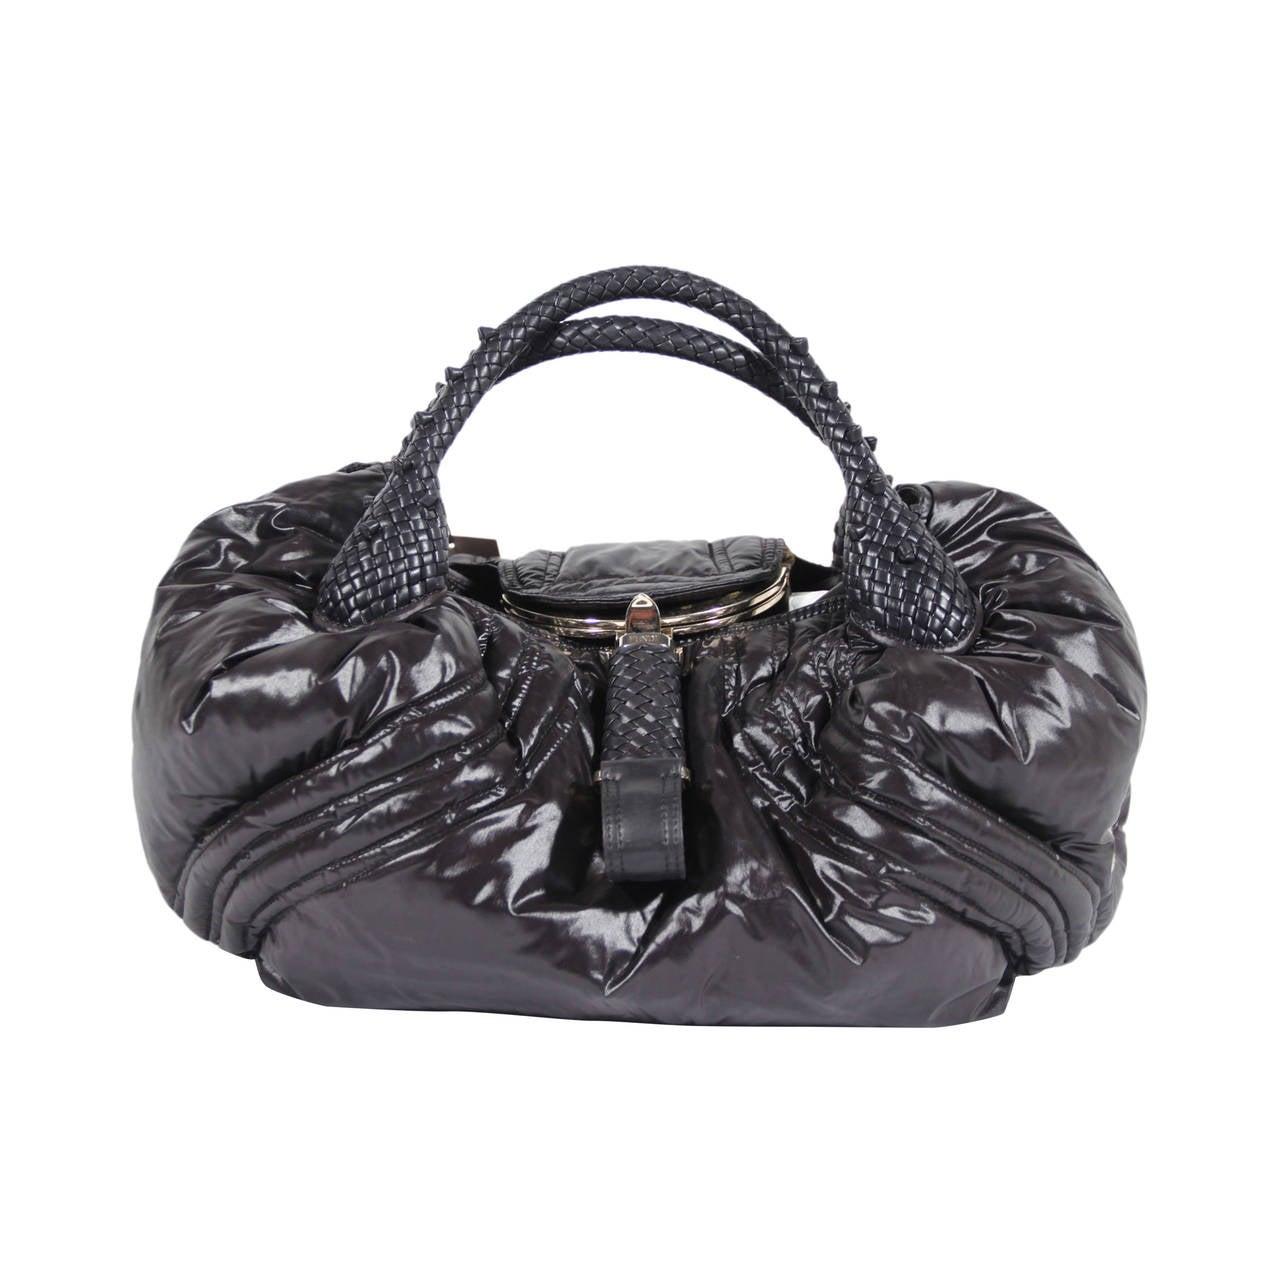 0974d90a5b02 FENDI LIMITED EDITION Black Nylon MONCLER SPY BAG Handbag HOBO For Sale 1  of 5 images. Brand  FENDI - Made in Italy Logos   Tags  ...